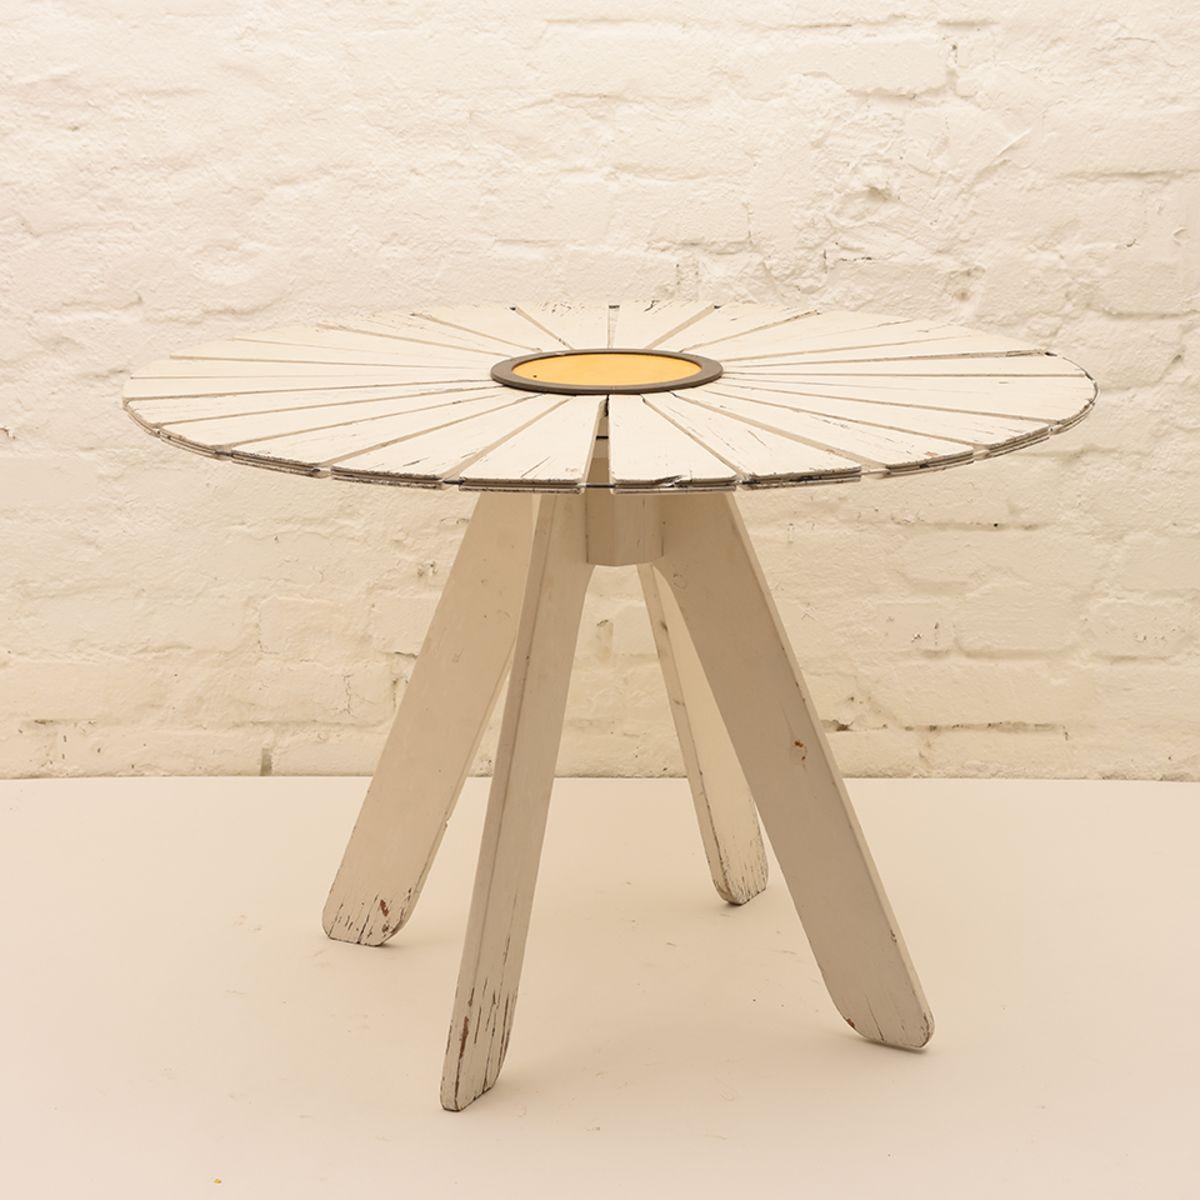 Alvar-Aalto_Sunflower-Garden-Table